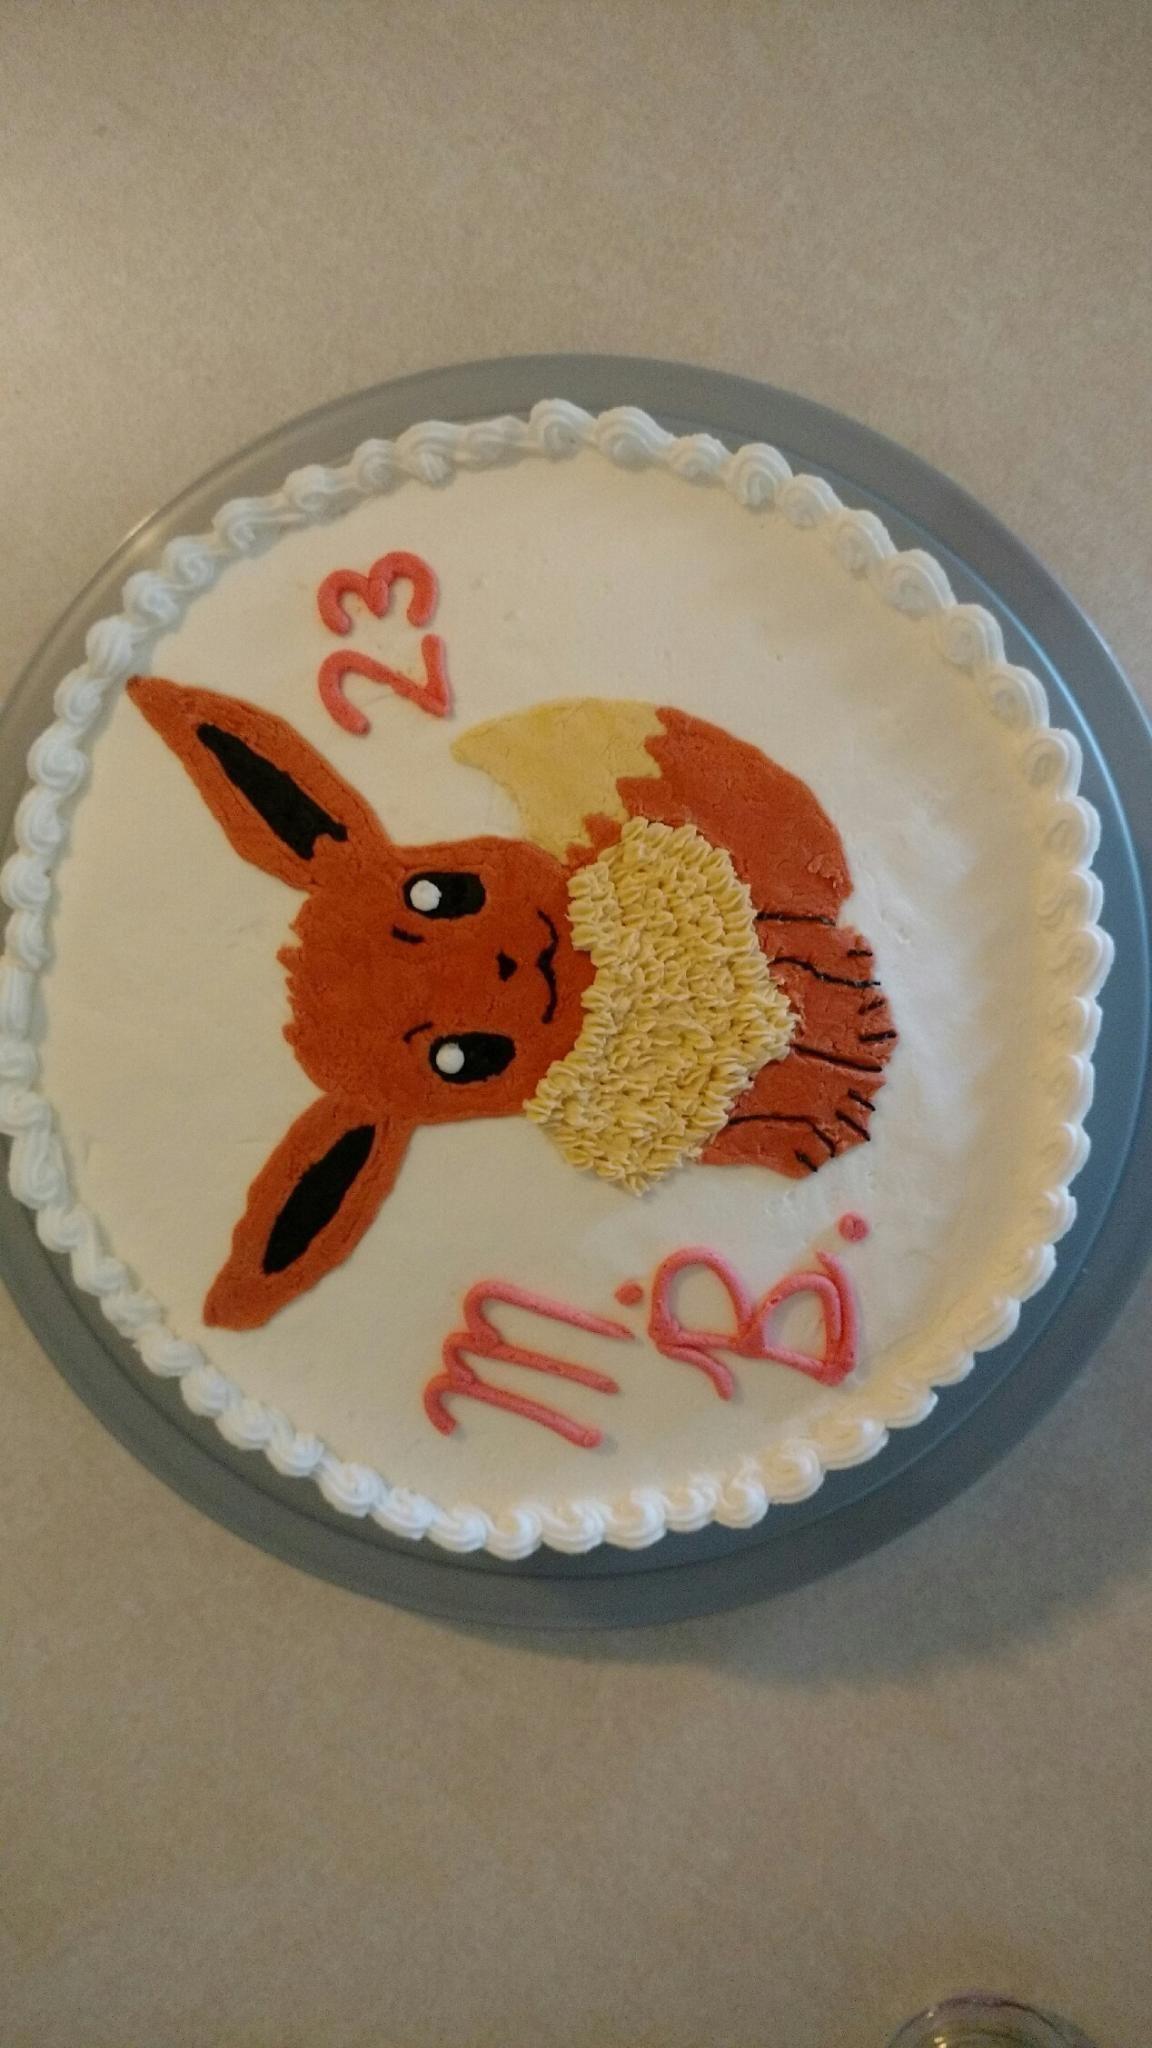 A Simple Eevee Cake Sara Bday Pinterest Cake